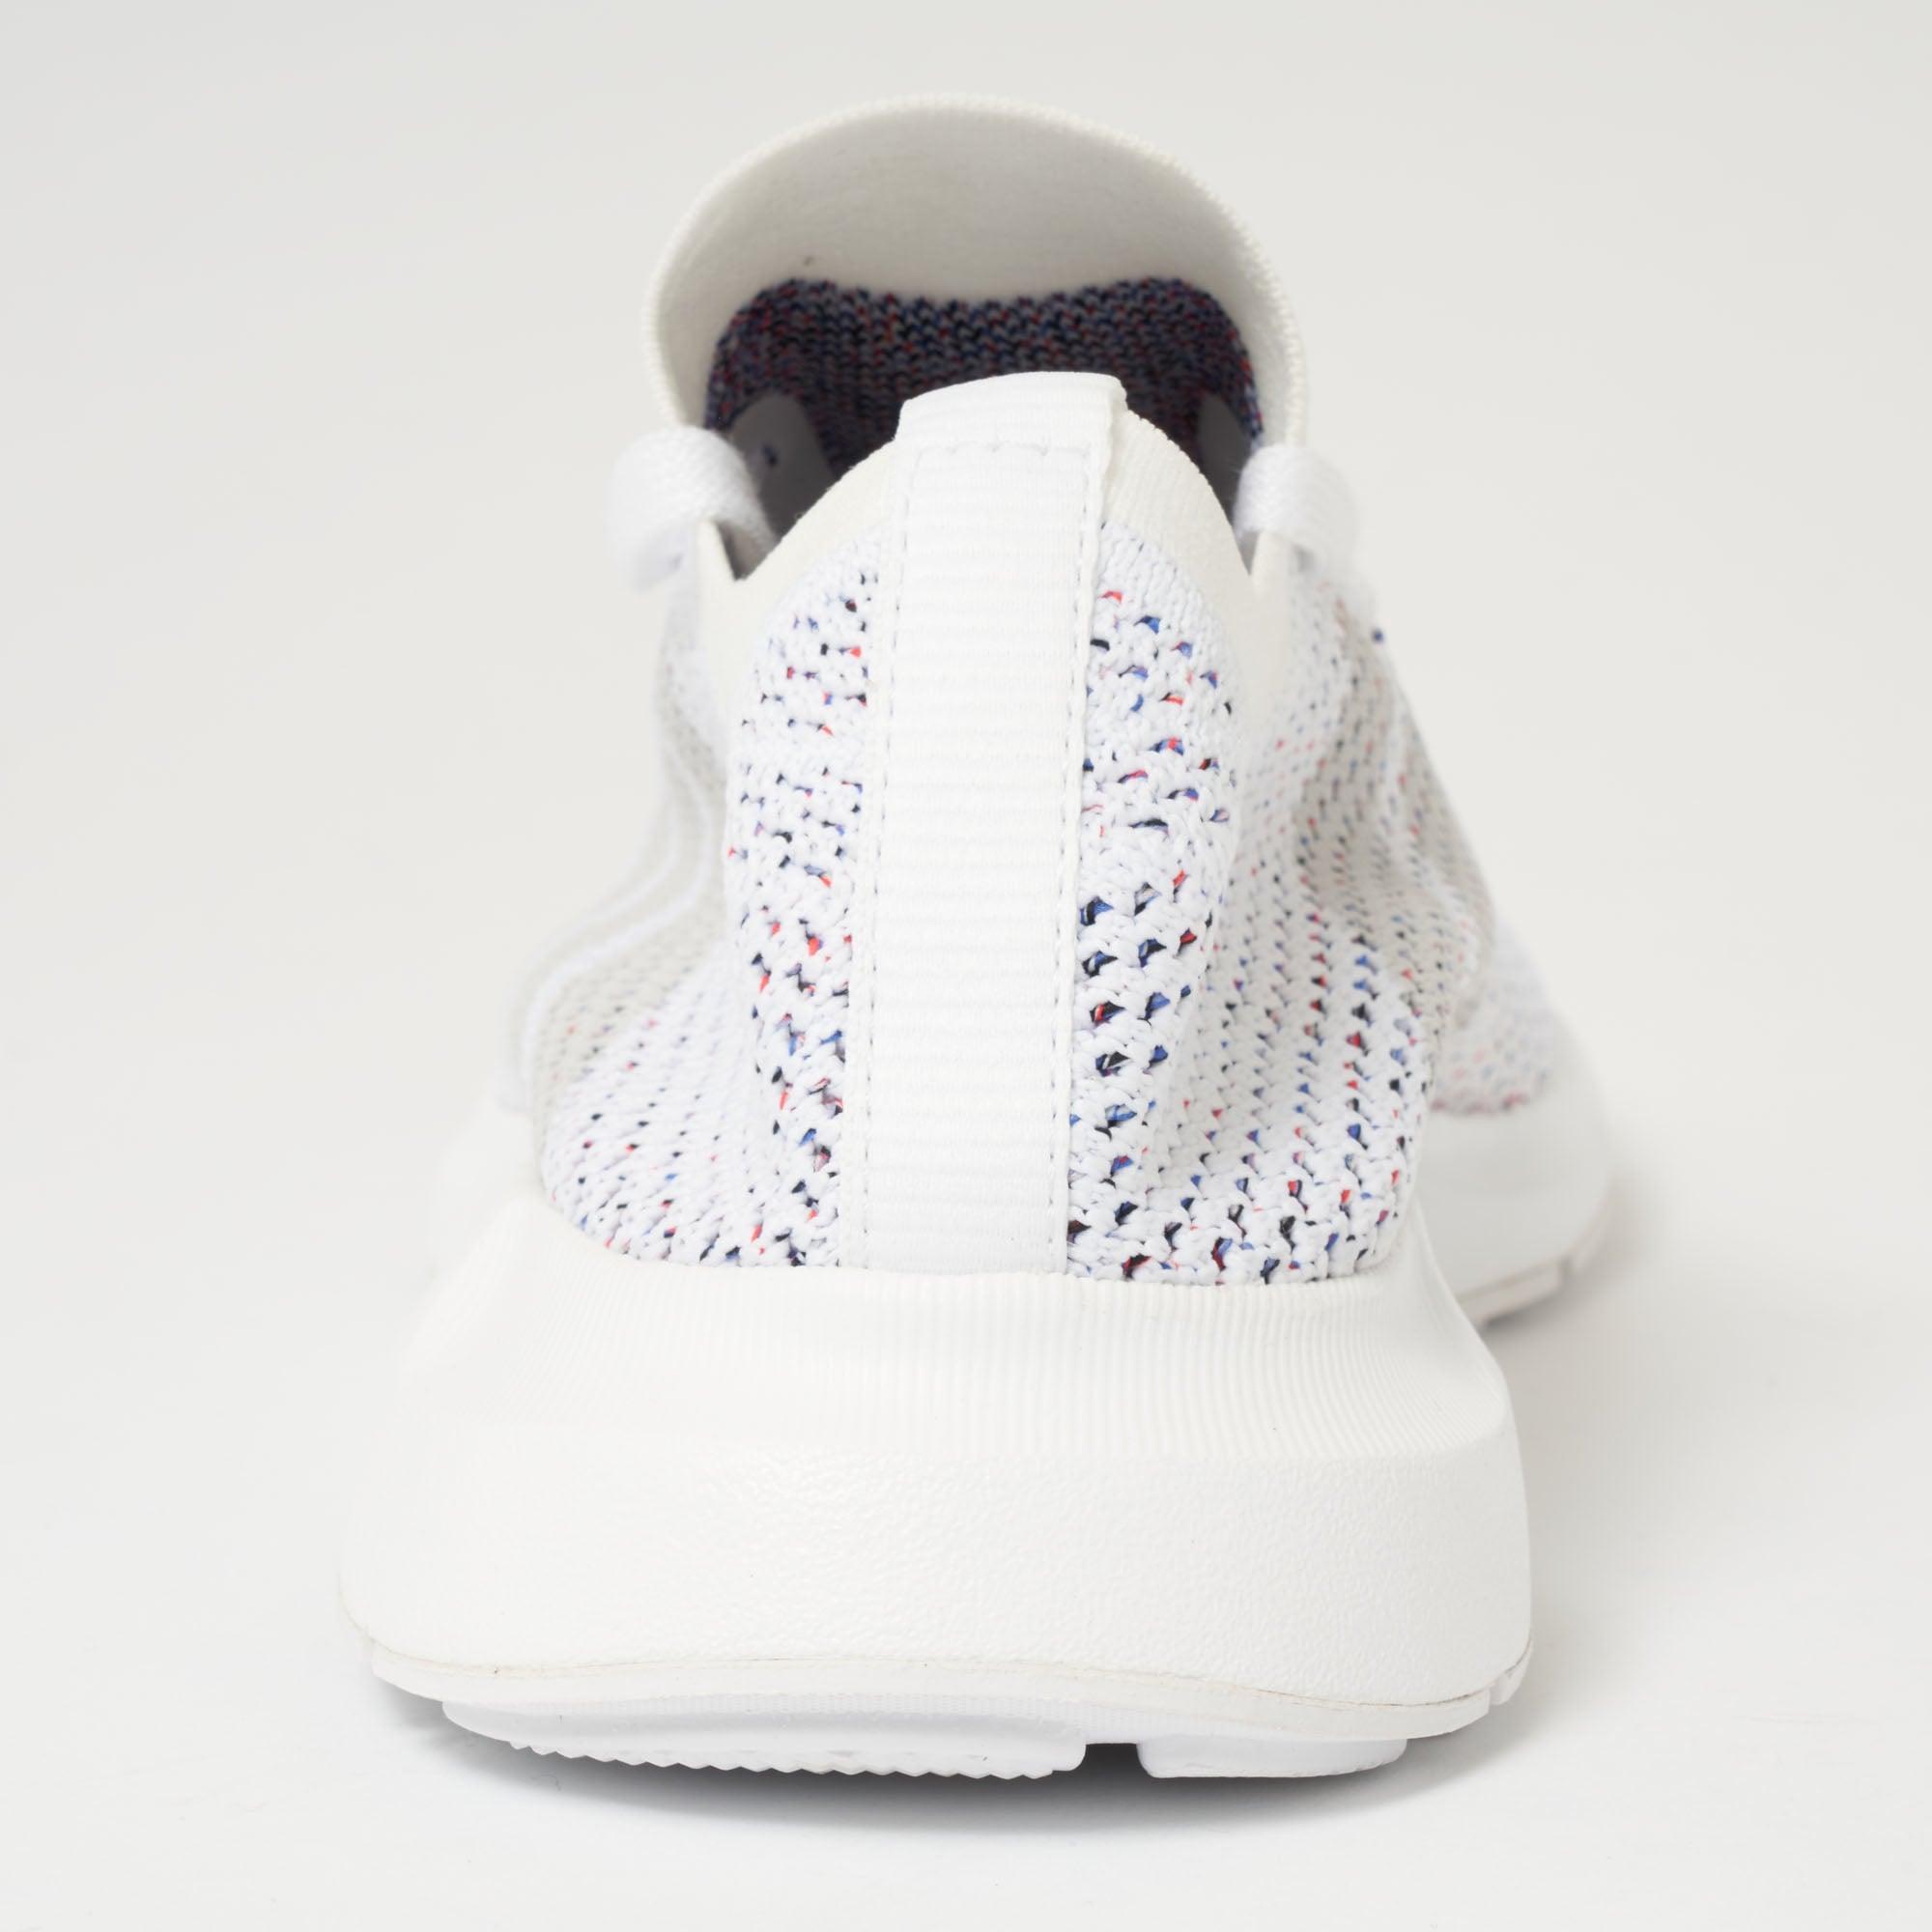 7aa8a6875bed Adidas Originals Swift Run PK (FTW White   Grey One) at Dandy Fellow